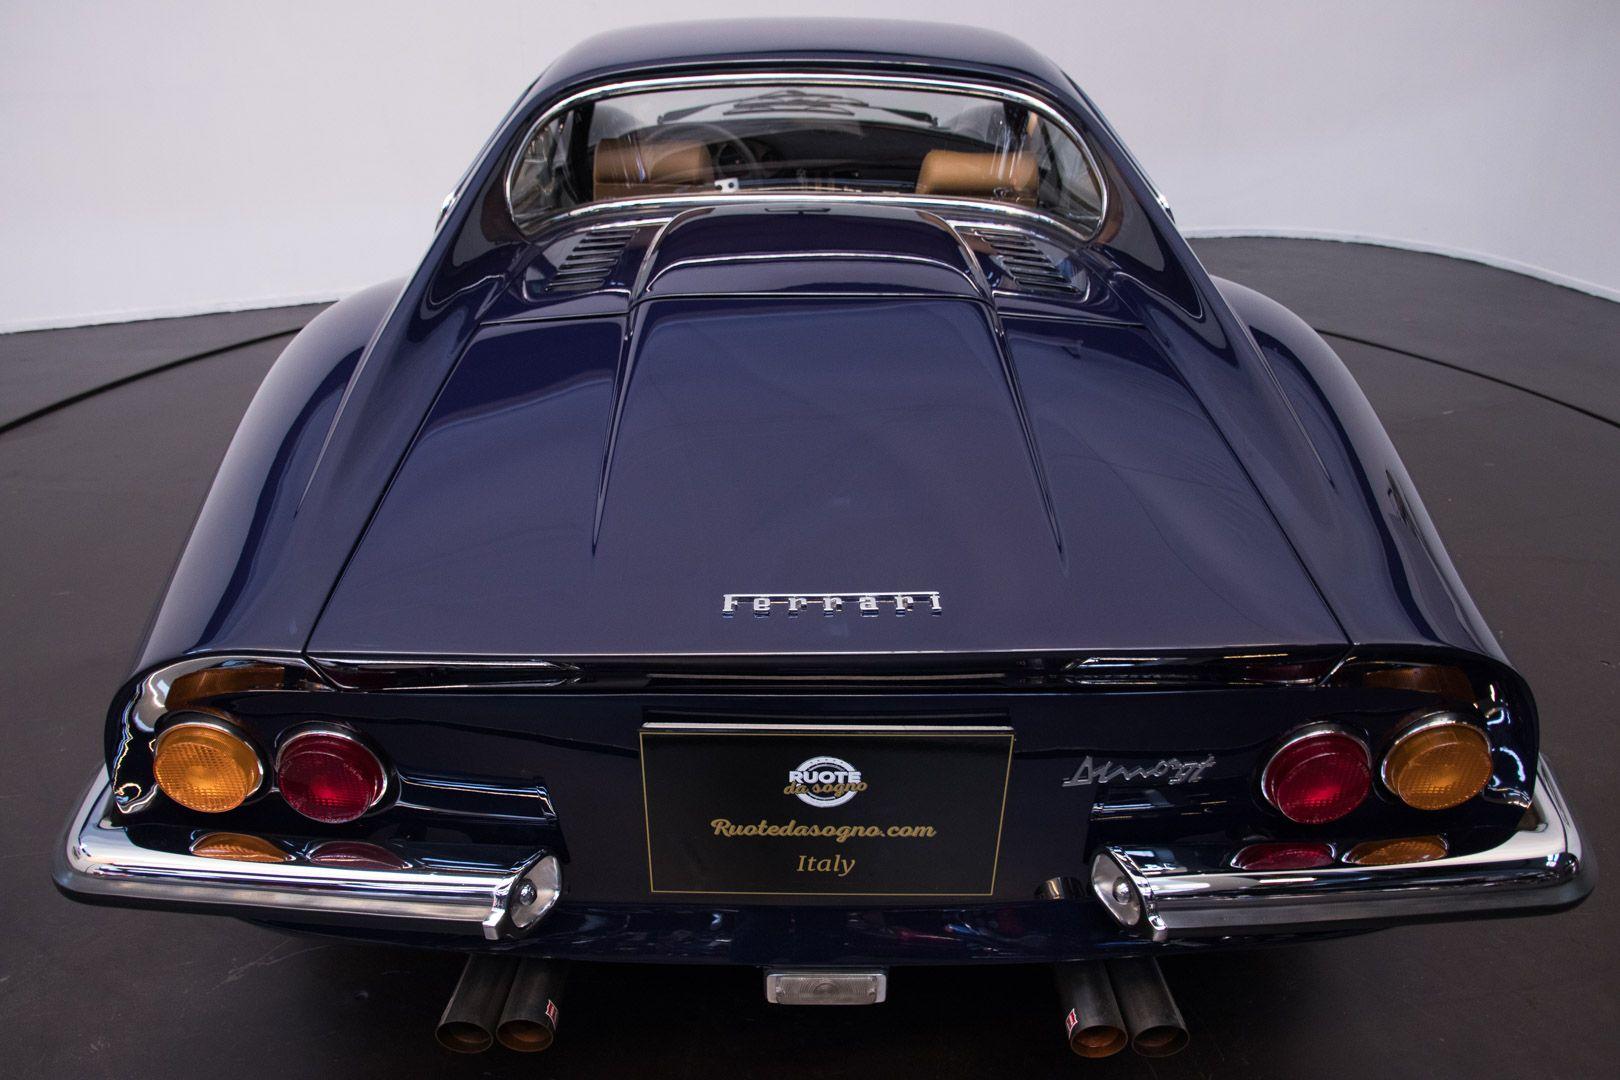 1972 Ferrari Dino 246 GT 17490